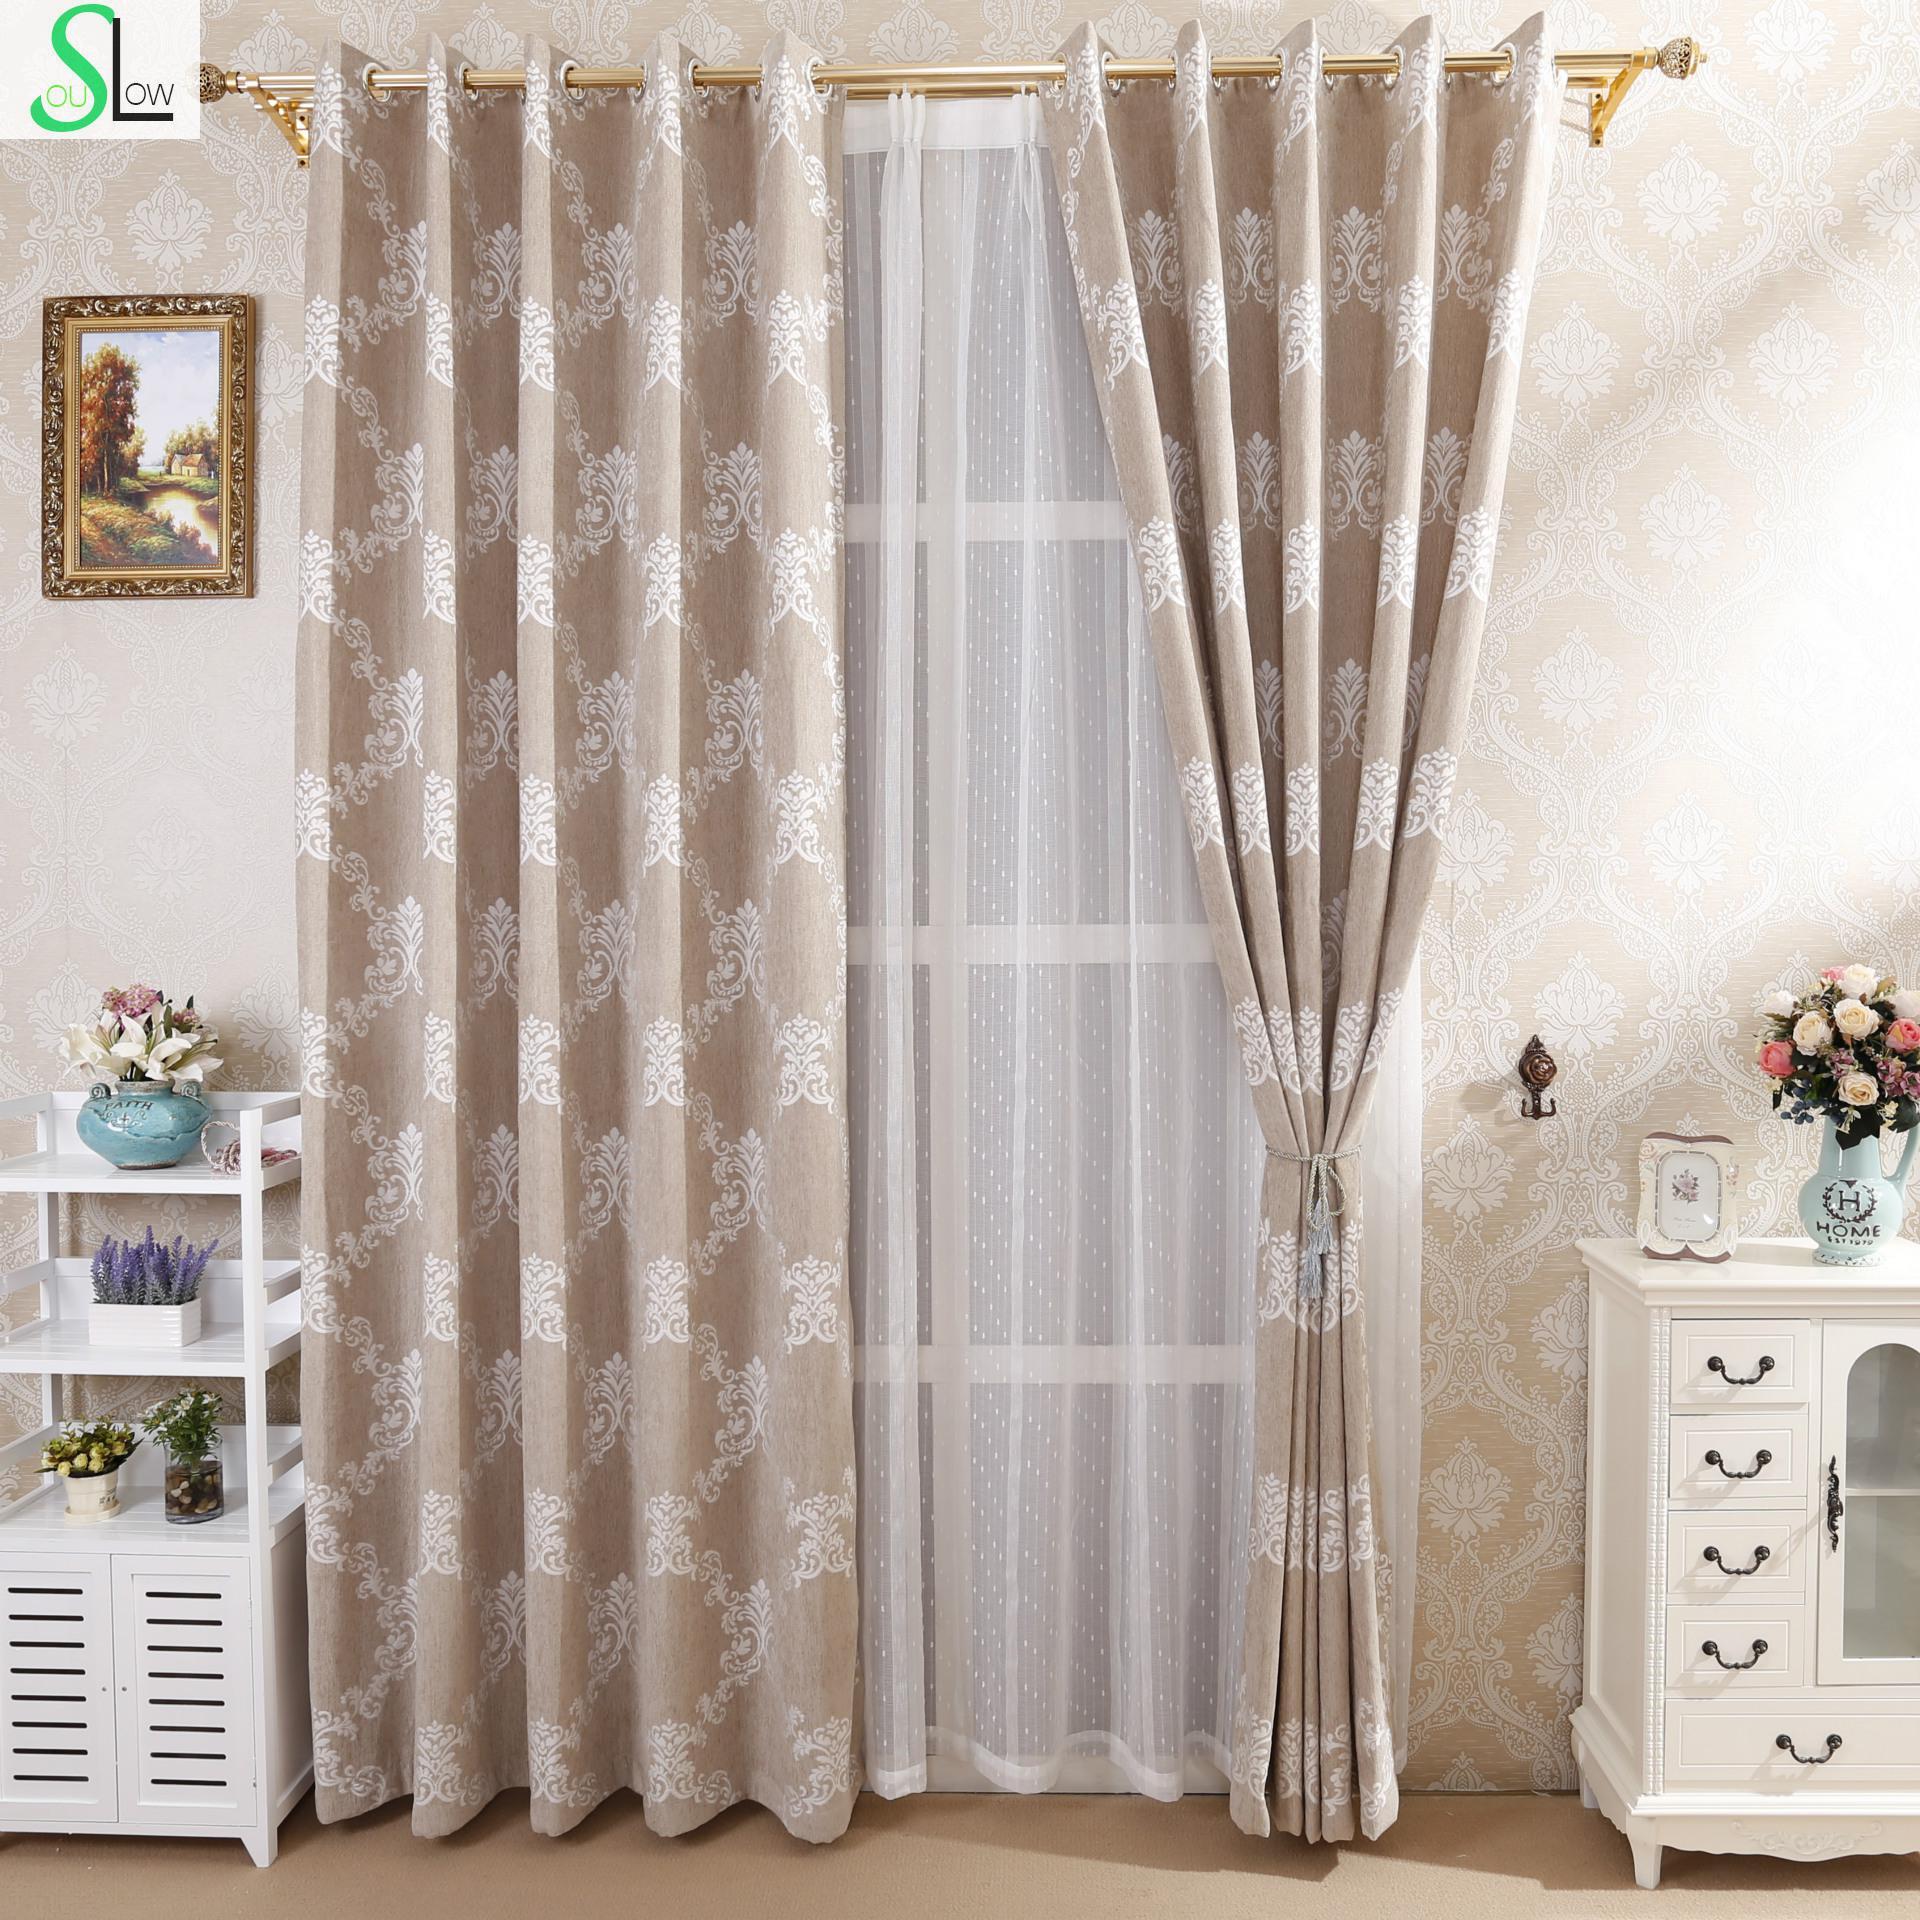 lento alma gris chenille jacquard tela de la cachemira europeo villa sala floral plisado cortinas para